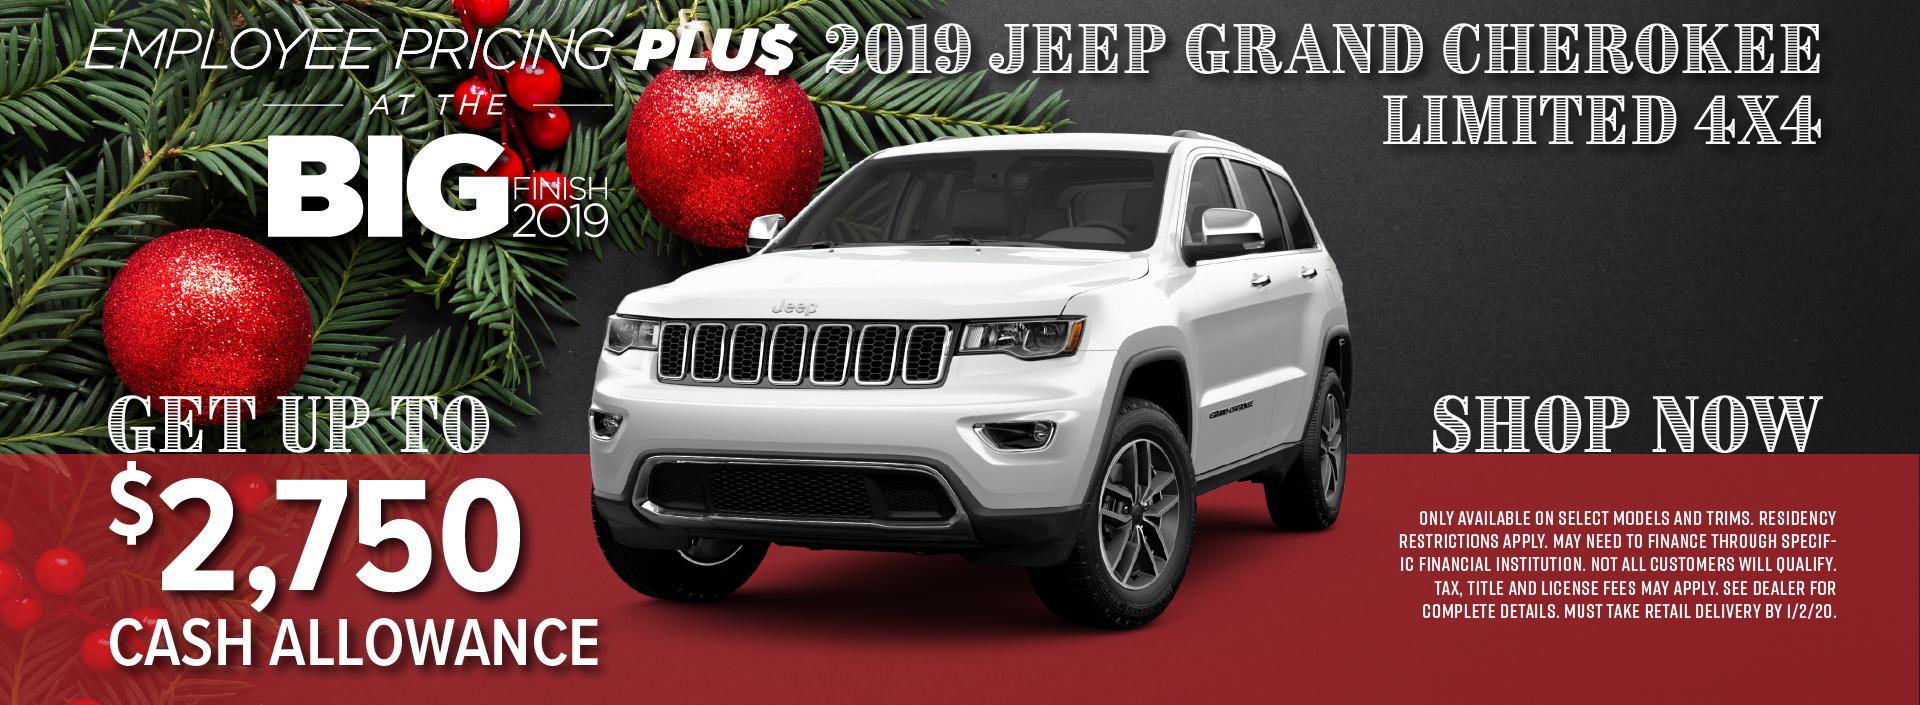 2019 Jeep Grand Cherokee Special near Thornton CO